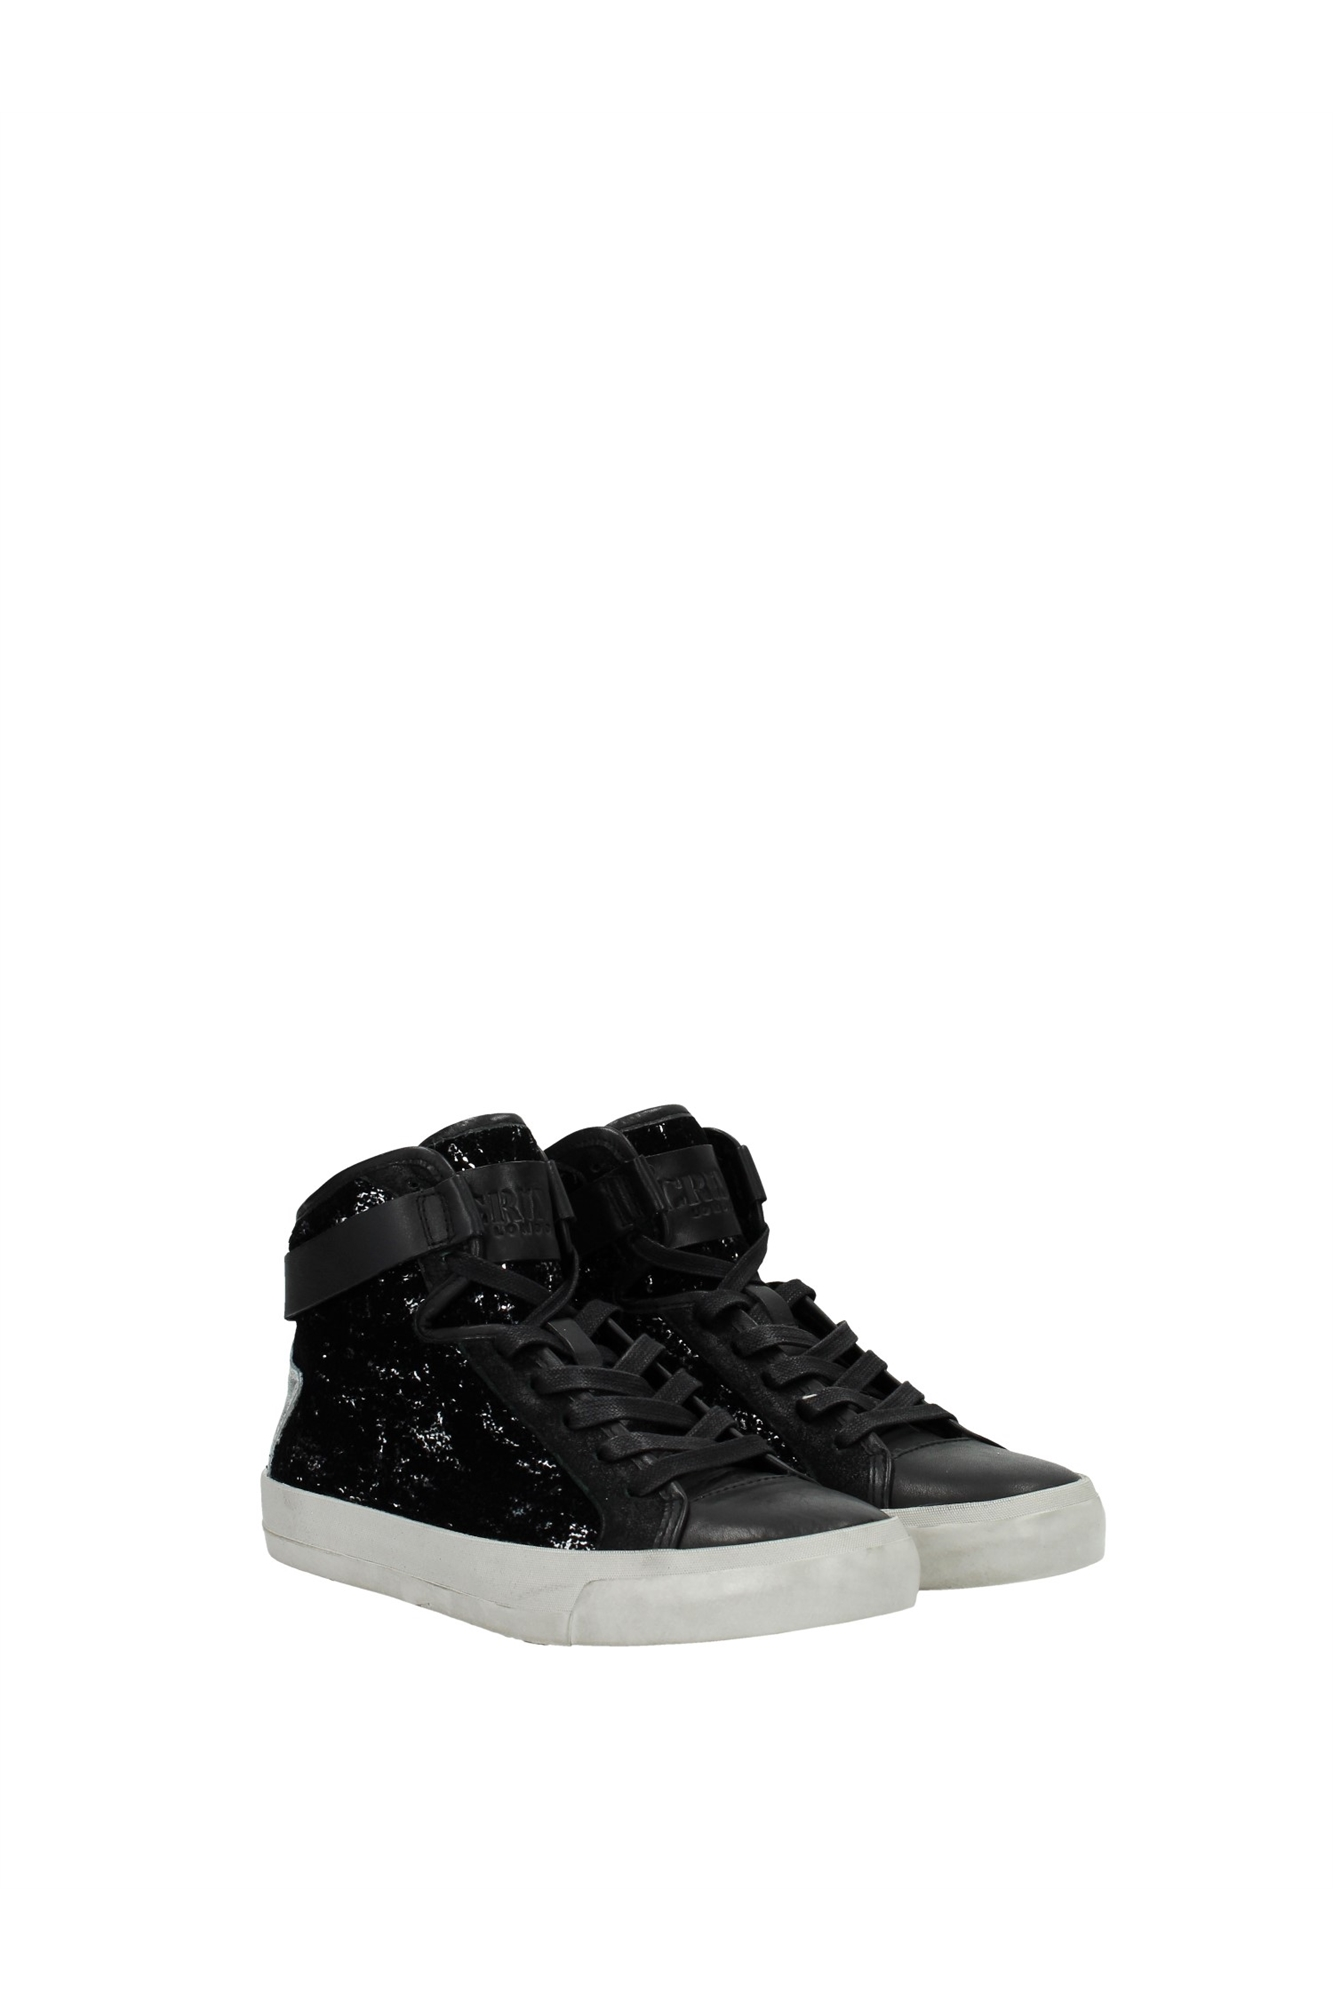 sneakers crime damen pailletten schwarz 25093a15b91 ebay. Black Bedroom Furniture Sets. Home Design Ideas